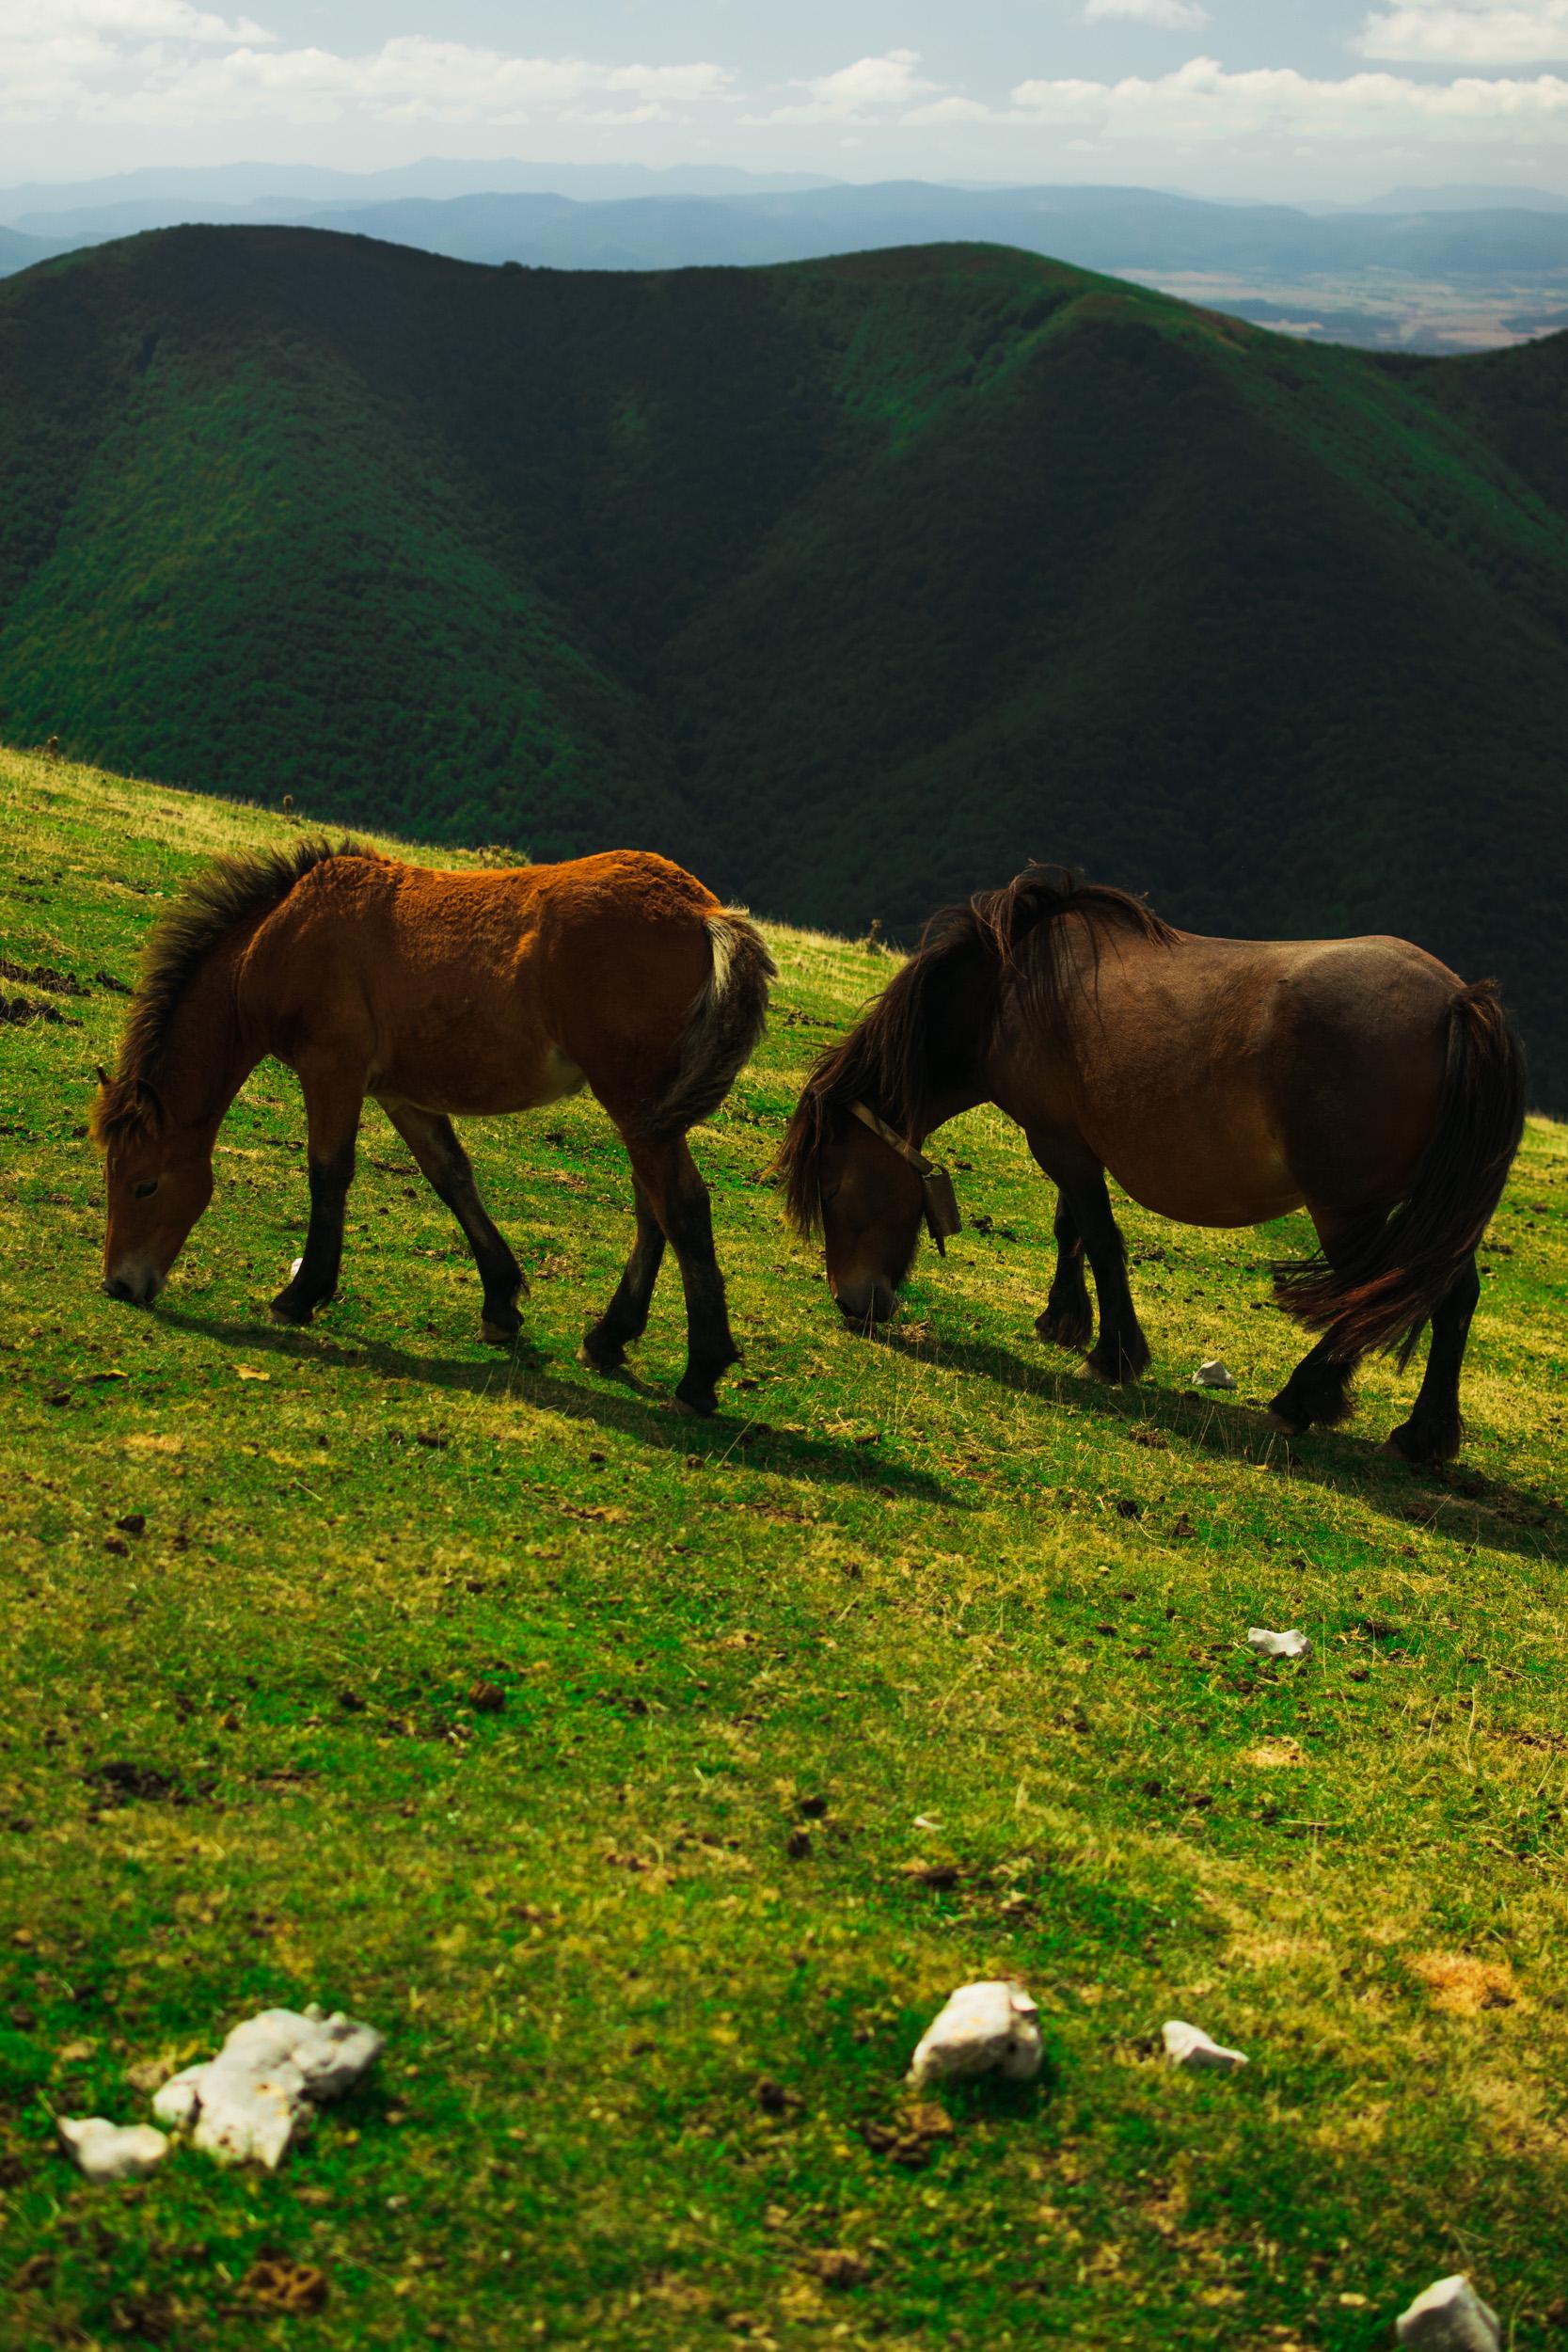 Horses and Basque Pony